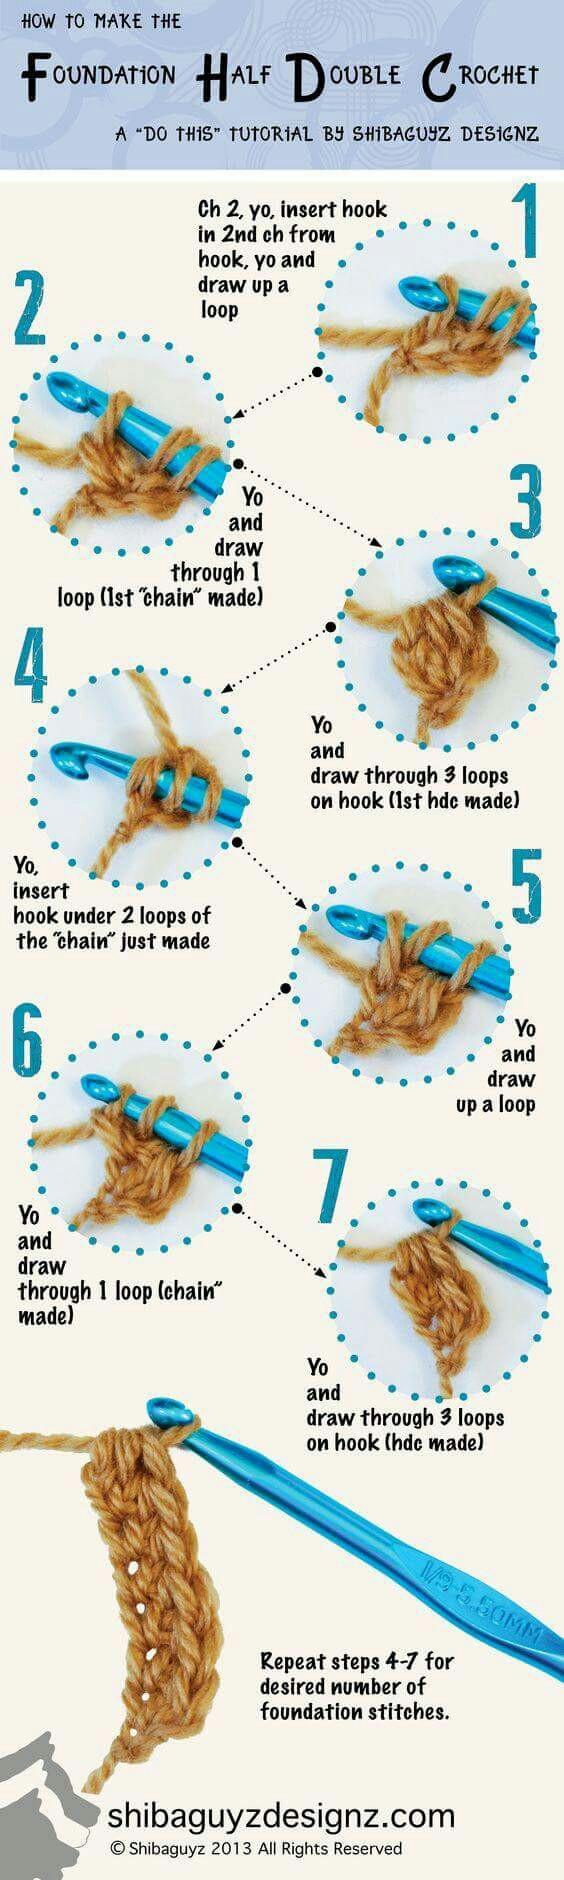 Pin de Wanda Baucom en Foundation Half Double Crochet | Pinterest ...